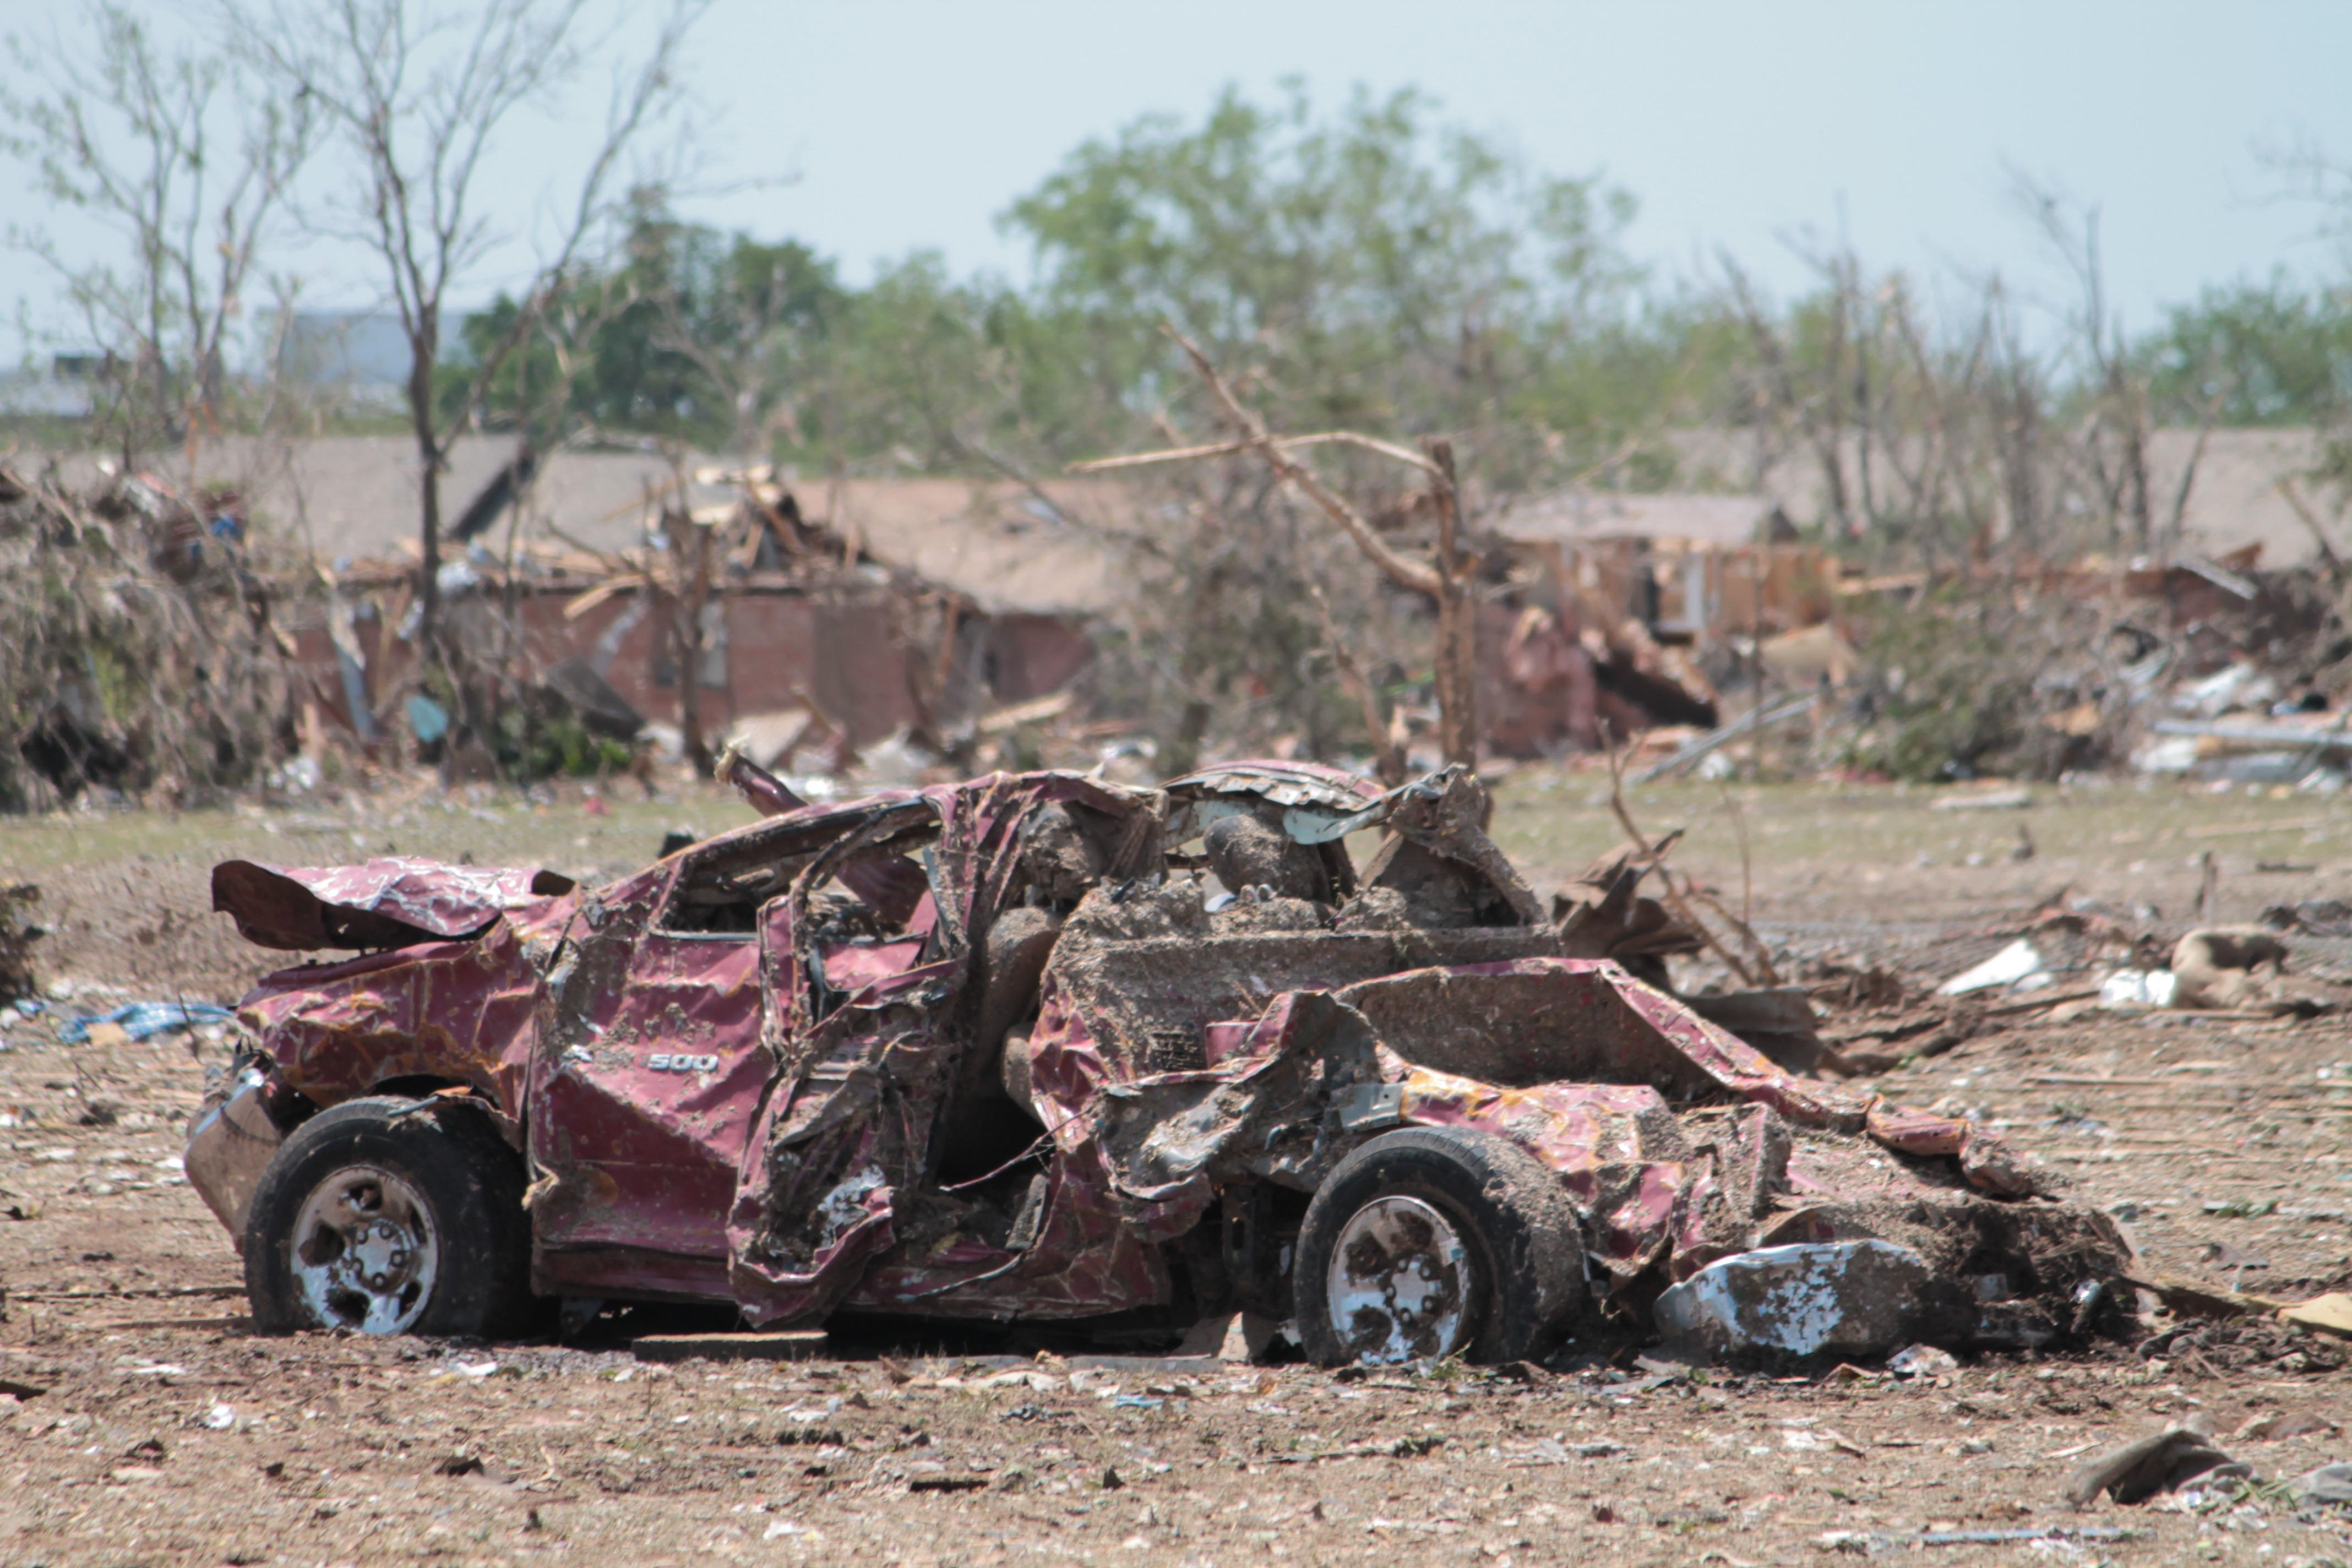 Car Truck Vehicle Mud Soil Ruin Material Destroyed Tornado Natural Disaster Destruction Oklahoma Damaged Moore